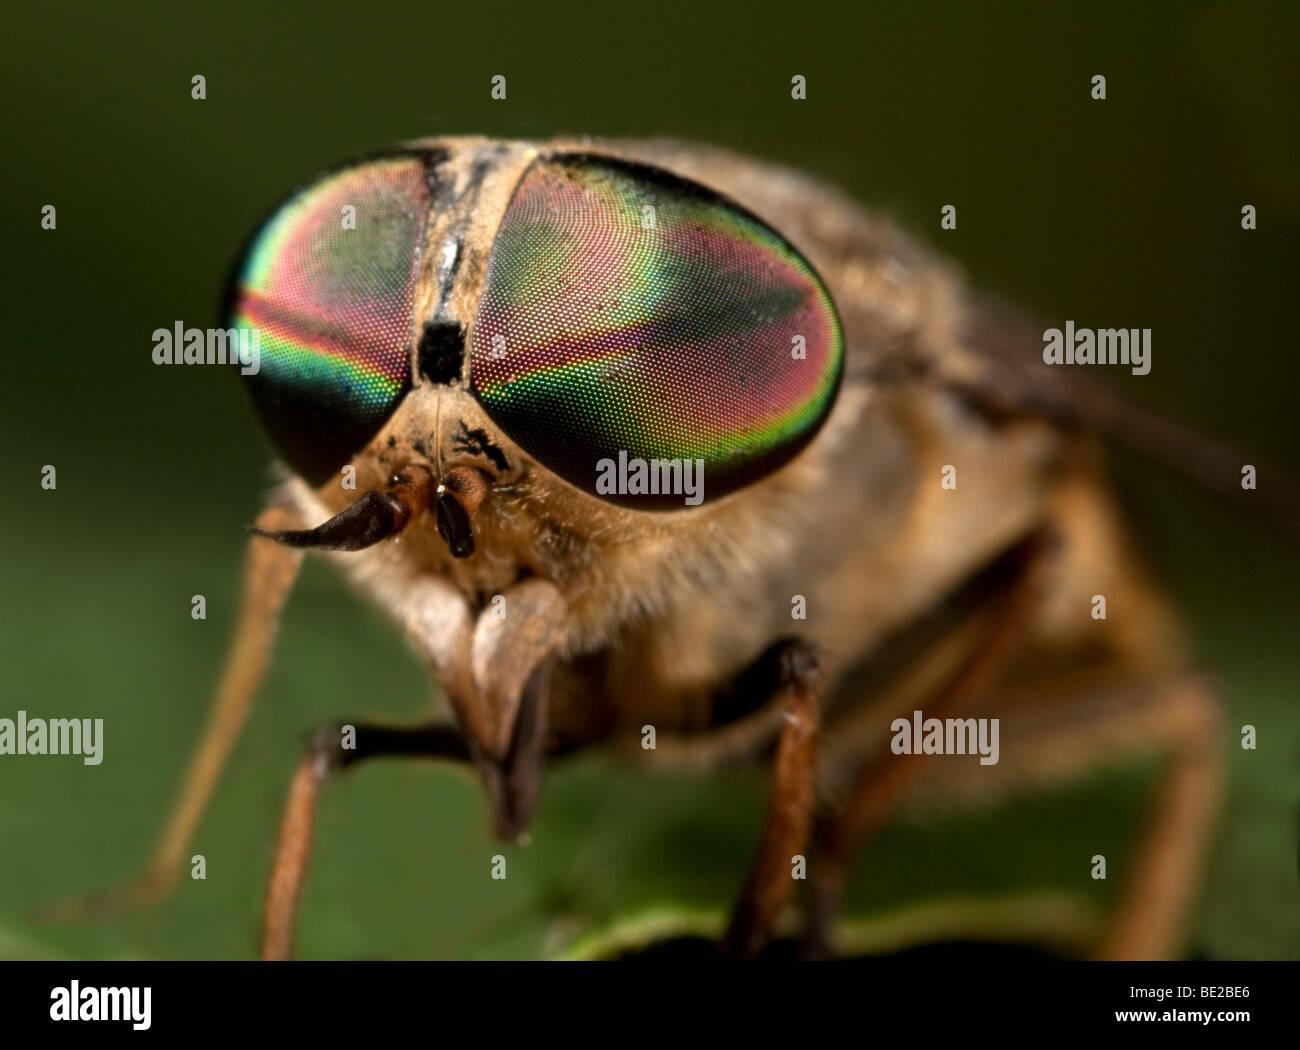 Tabanus bromius Horse Fly macro close up montrant grand œil composé Photo Stock